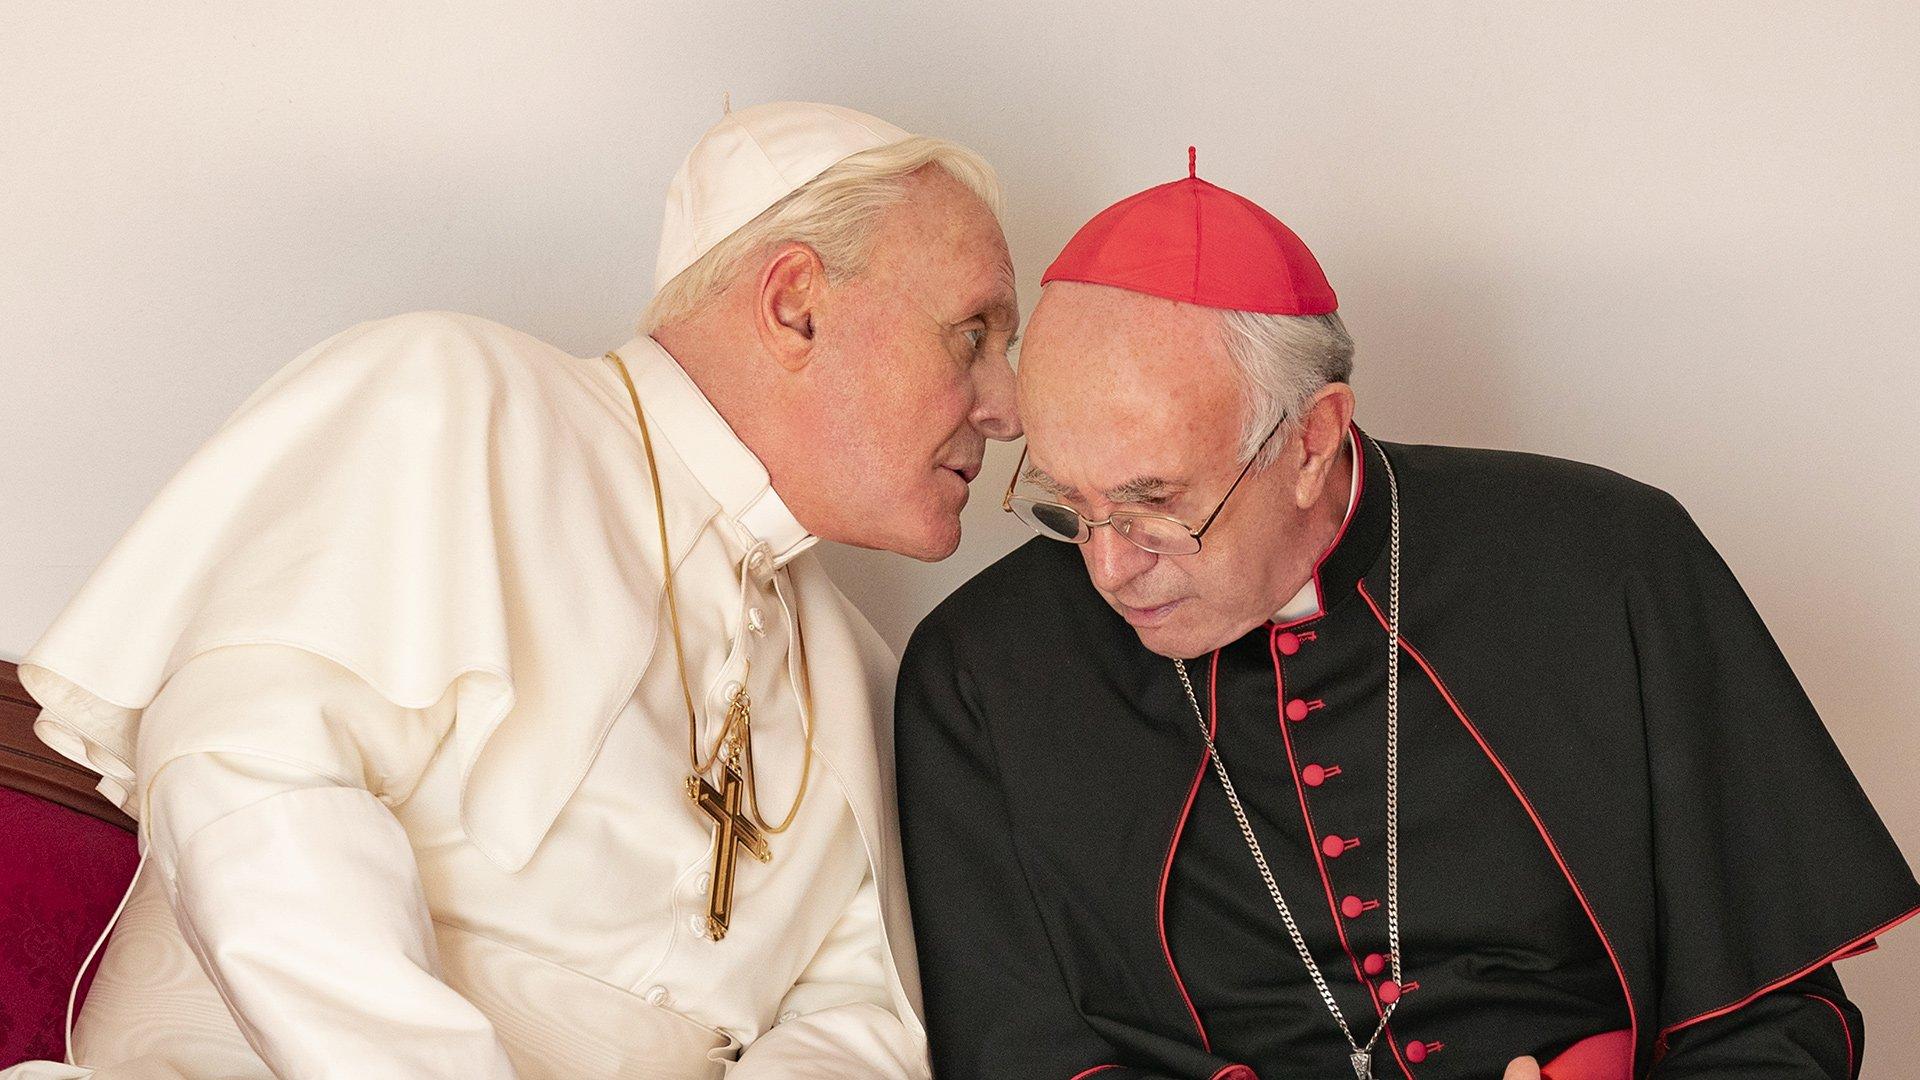 Due papi, una svolta. Ratzinger vs Bergoglio nel film Netflix, in corsa per l'Oscar - Bookciakmagazine